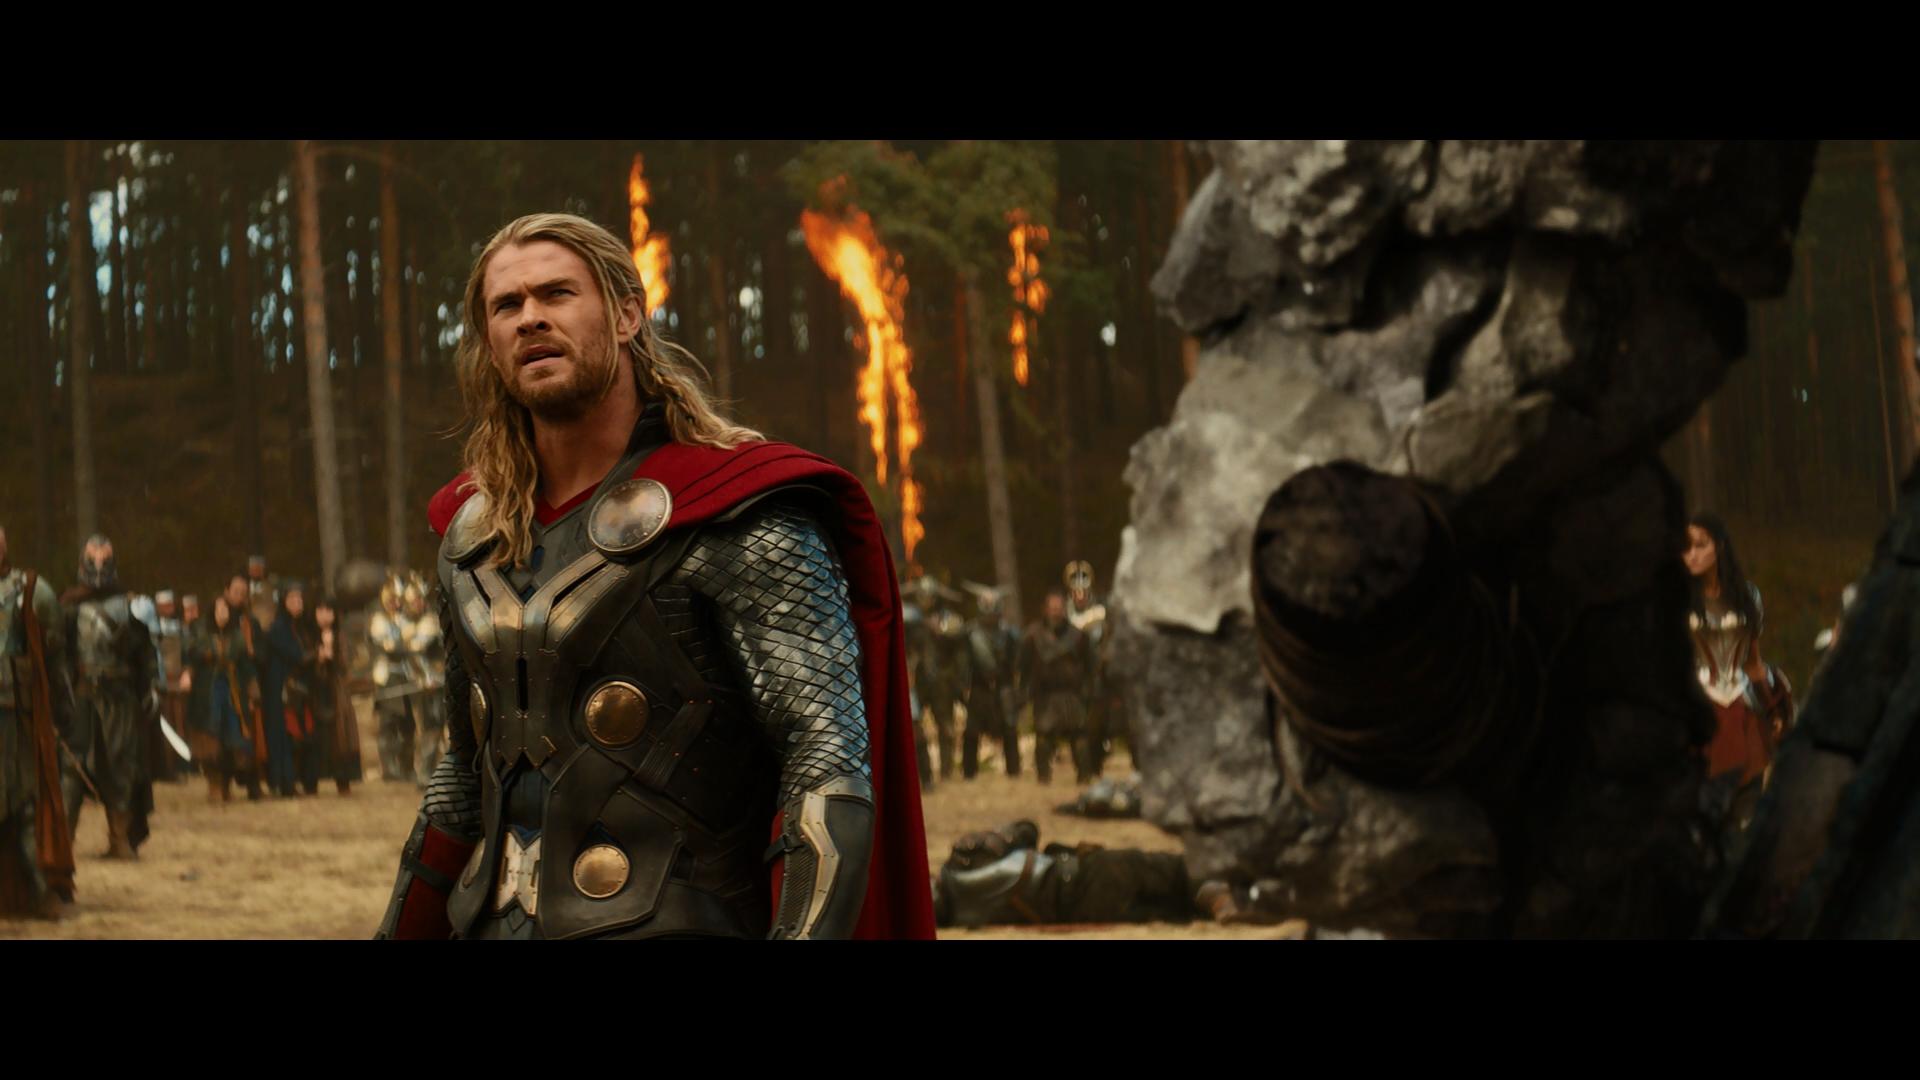 Thor Temny Svet Cz